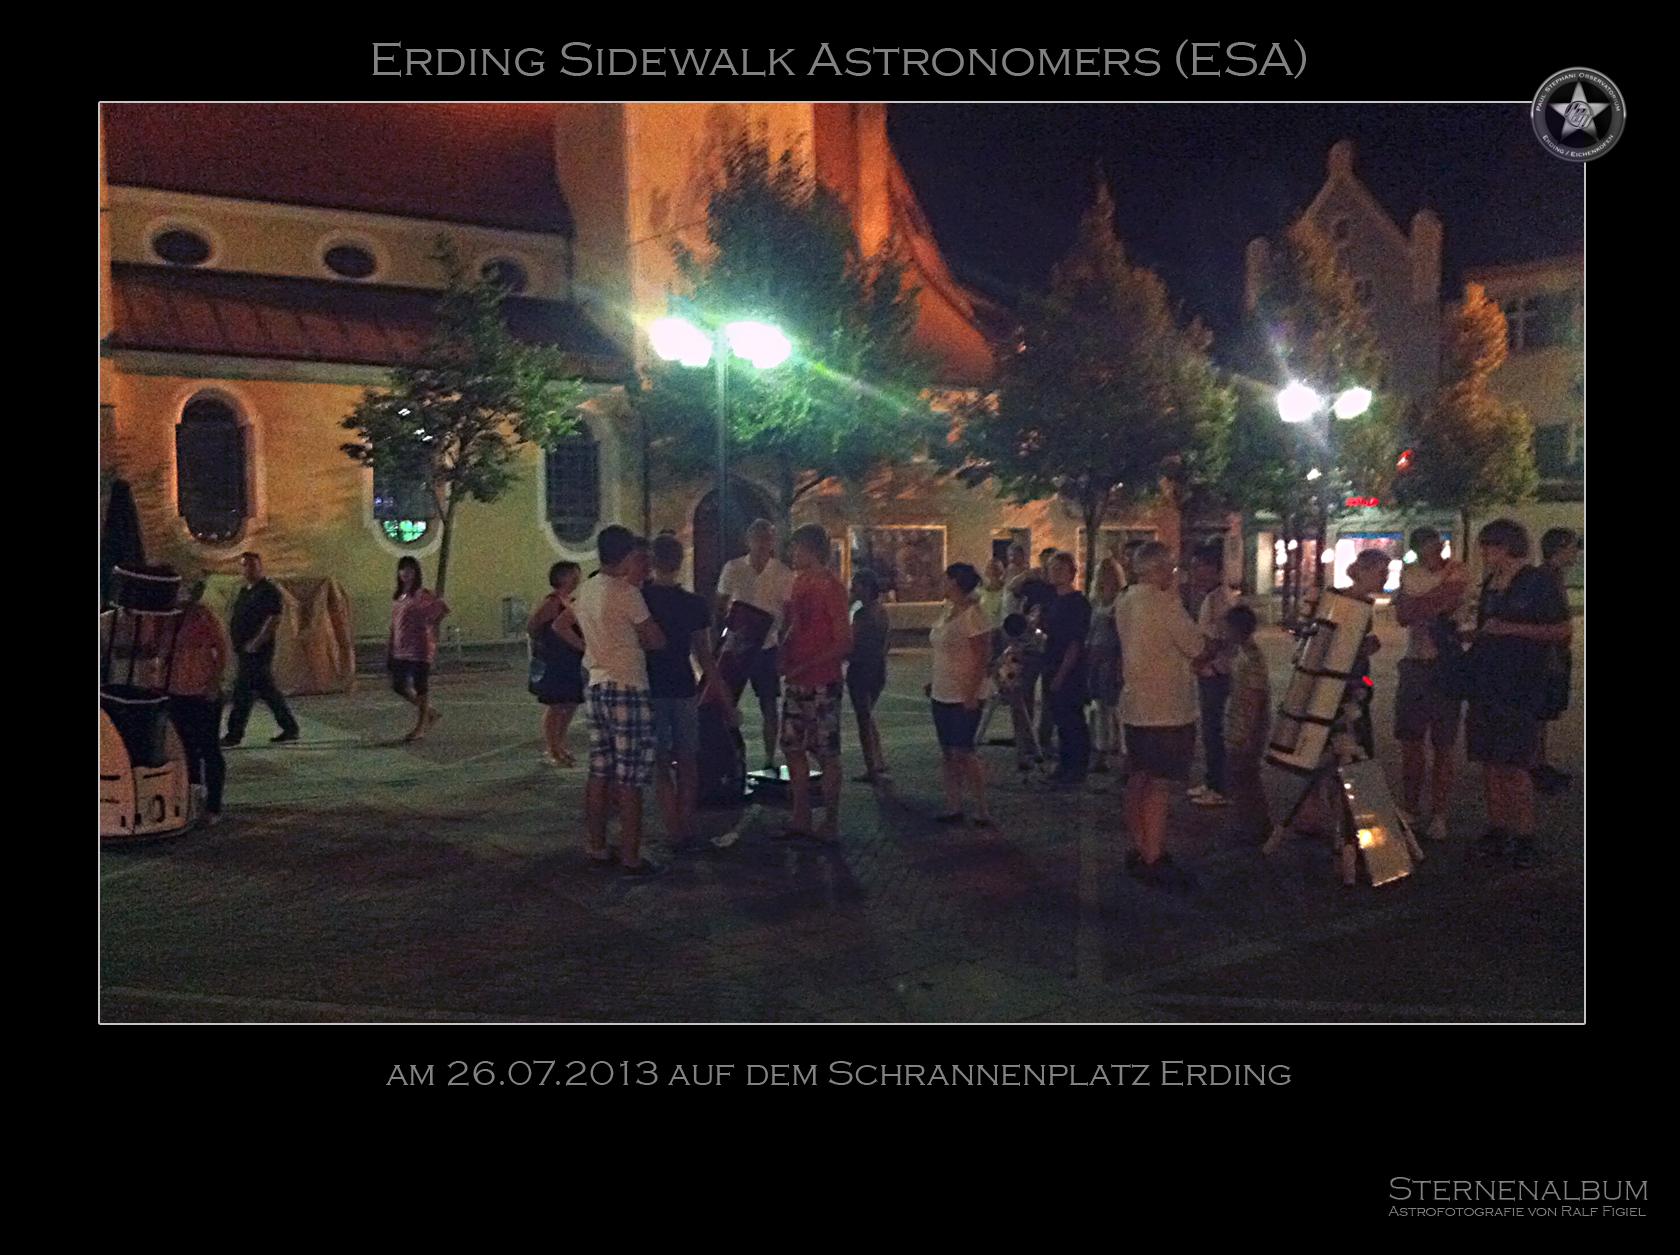 Erding Sidewalk Astonomers